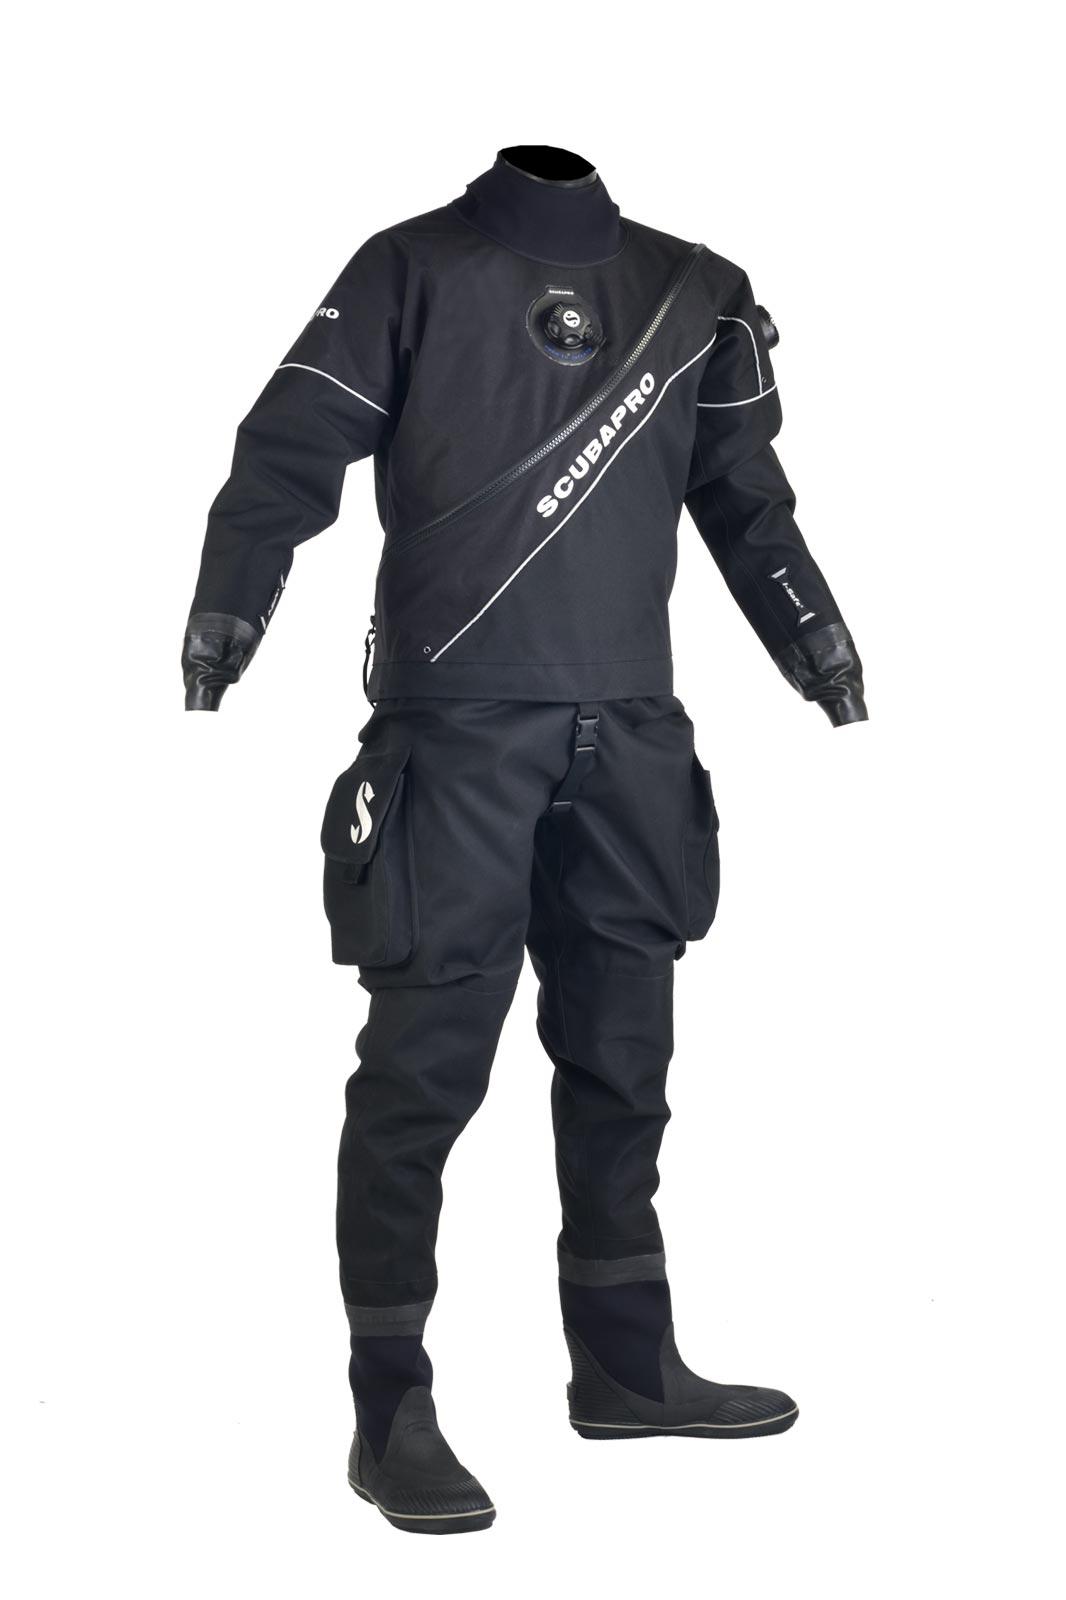 Сух водолазен костюм от Триламинат EXTENDER - Scubapro